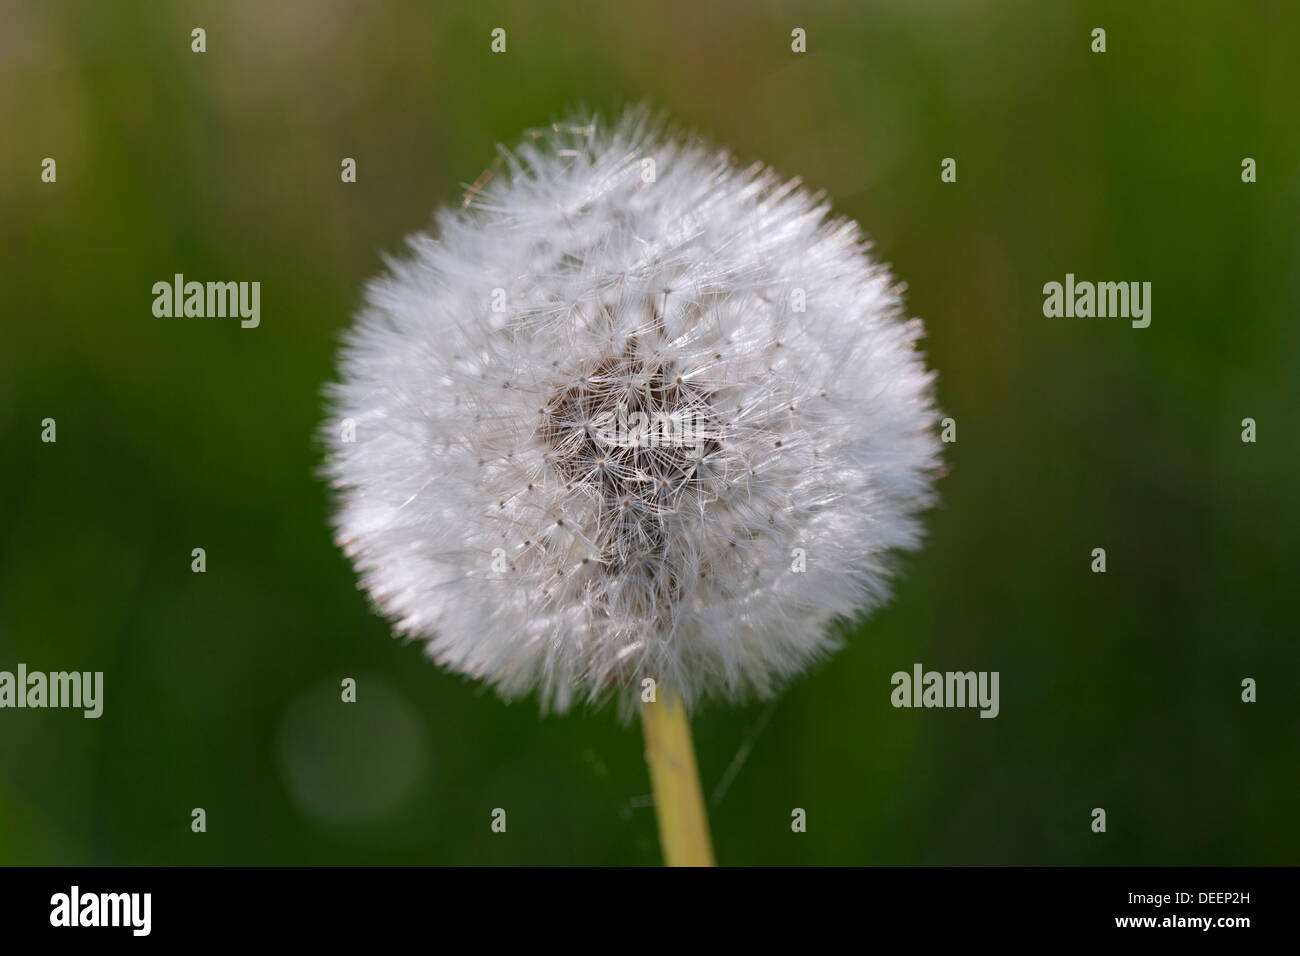 Common Dandelion (Taraxacum officinale) seedhead / seed head in meadow in spring - Stock Image